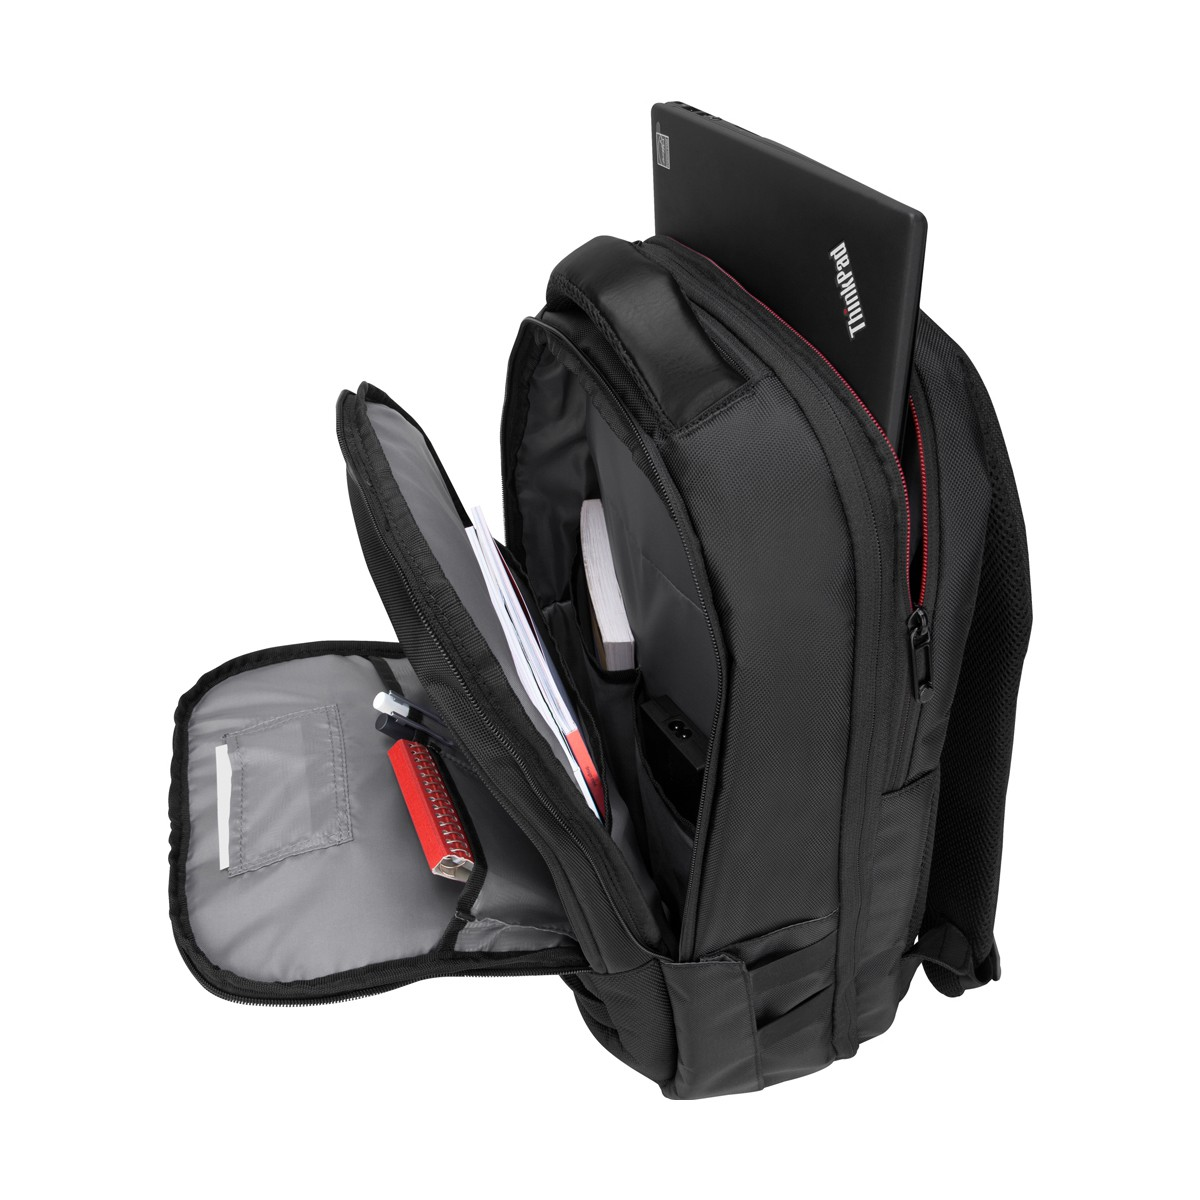 (EOL) LENOVO® ThinkPad® Professional Backpack Rucksack